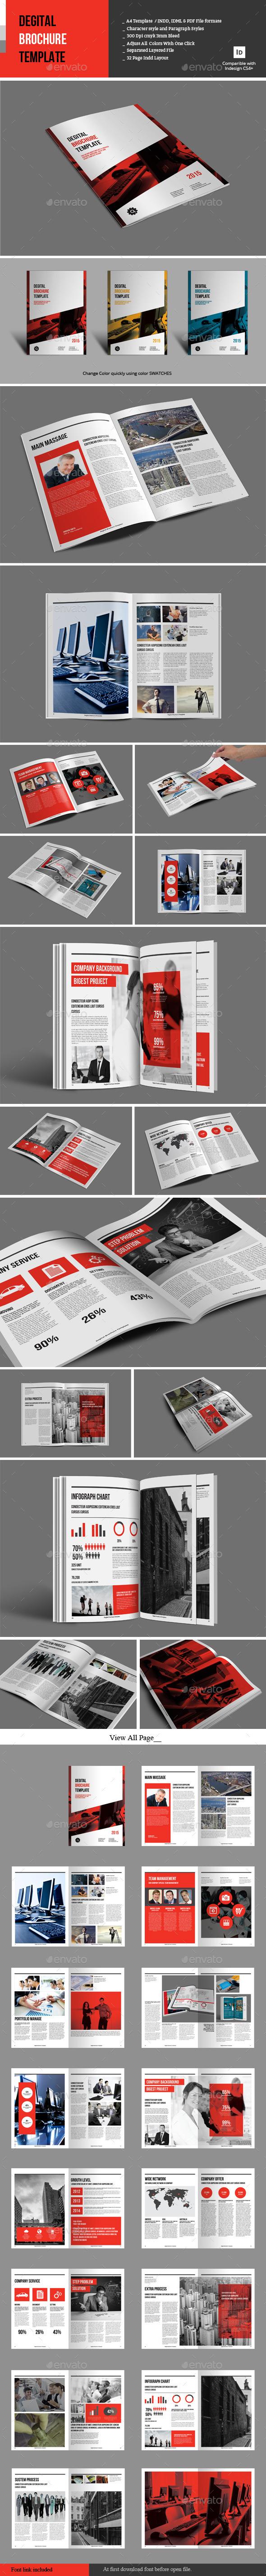 Degital Brochure Template - Corporate Brochures